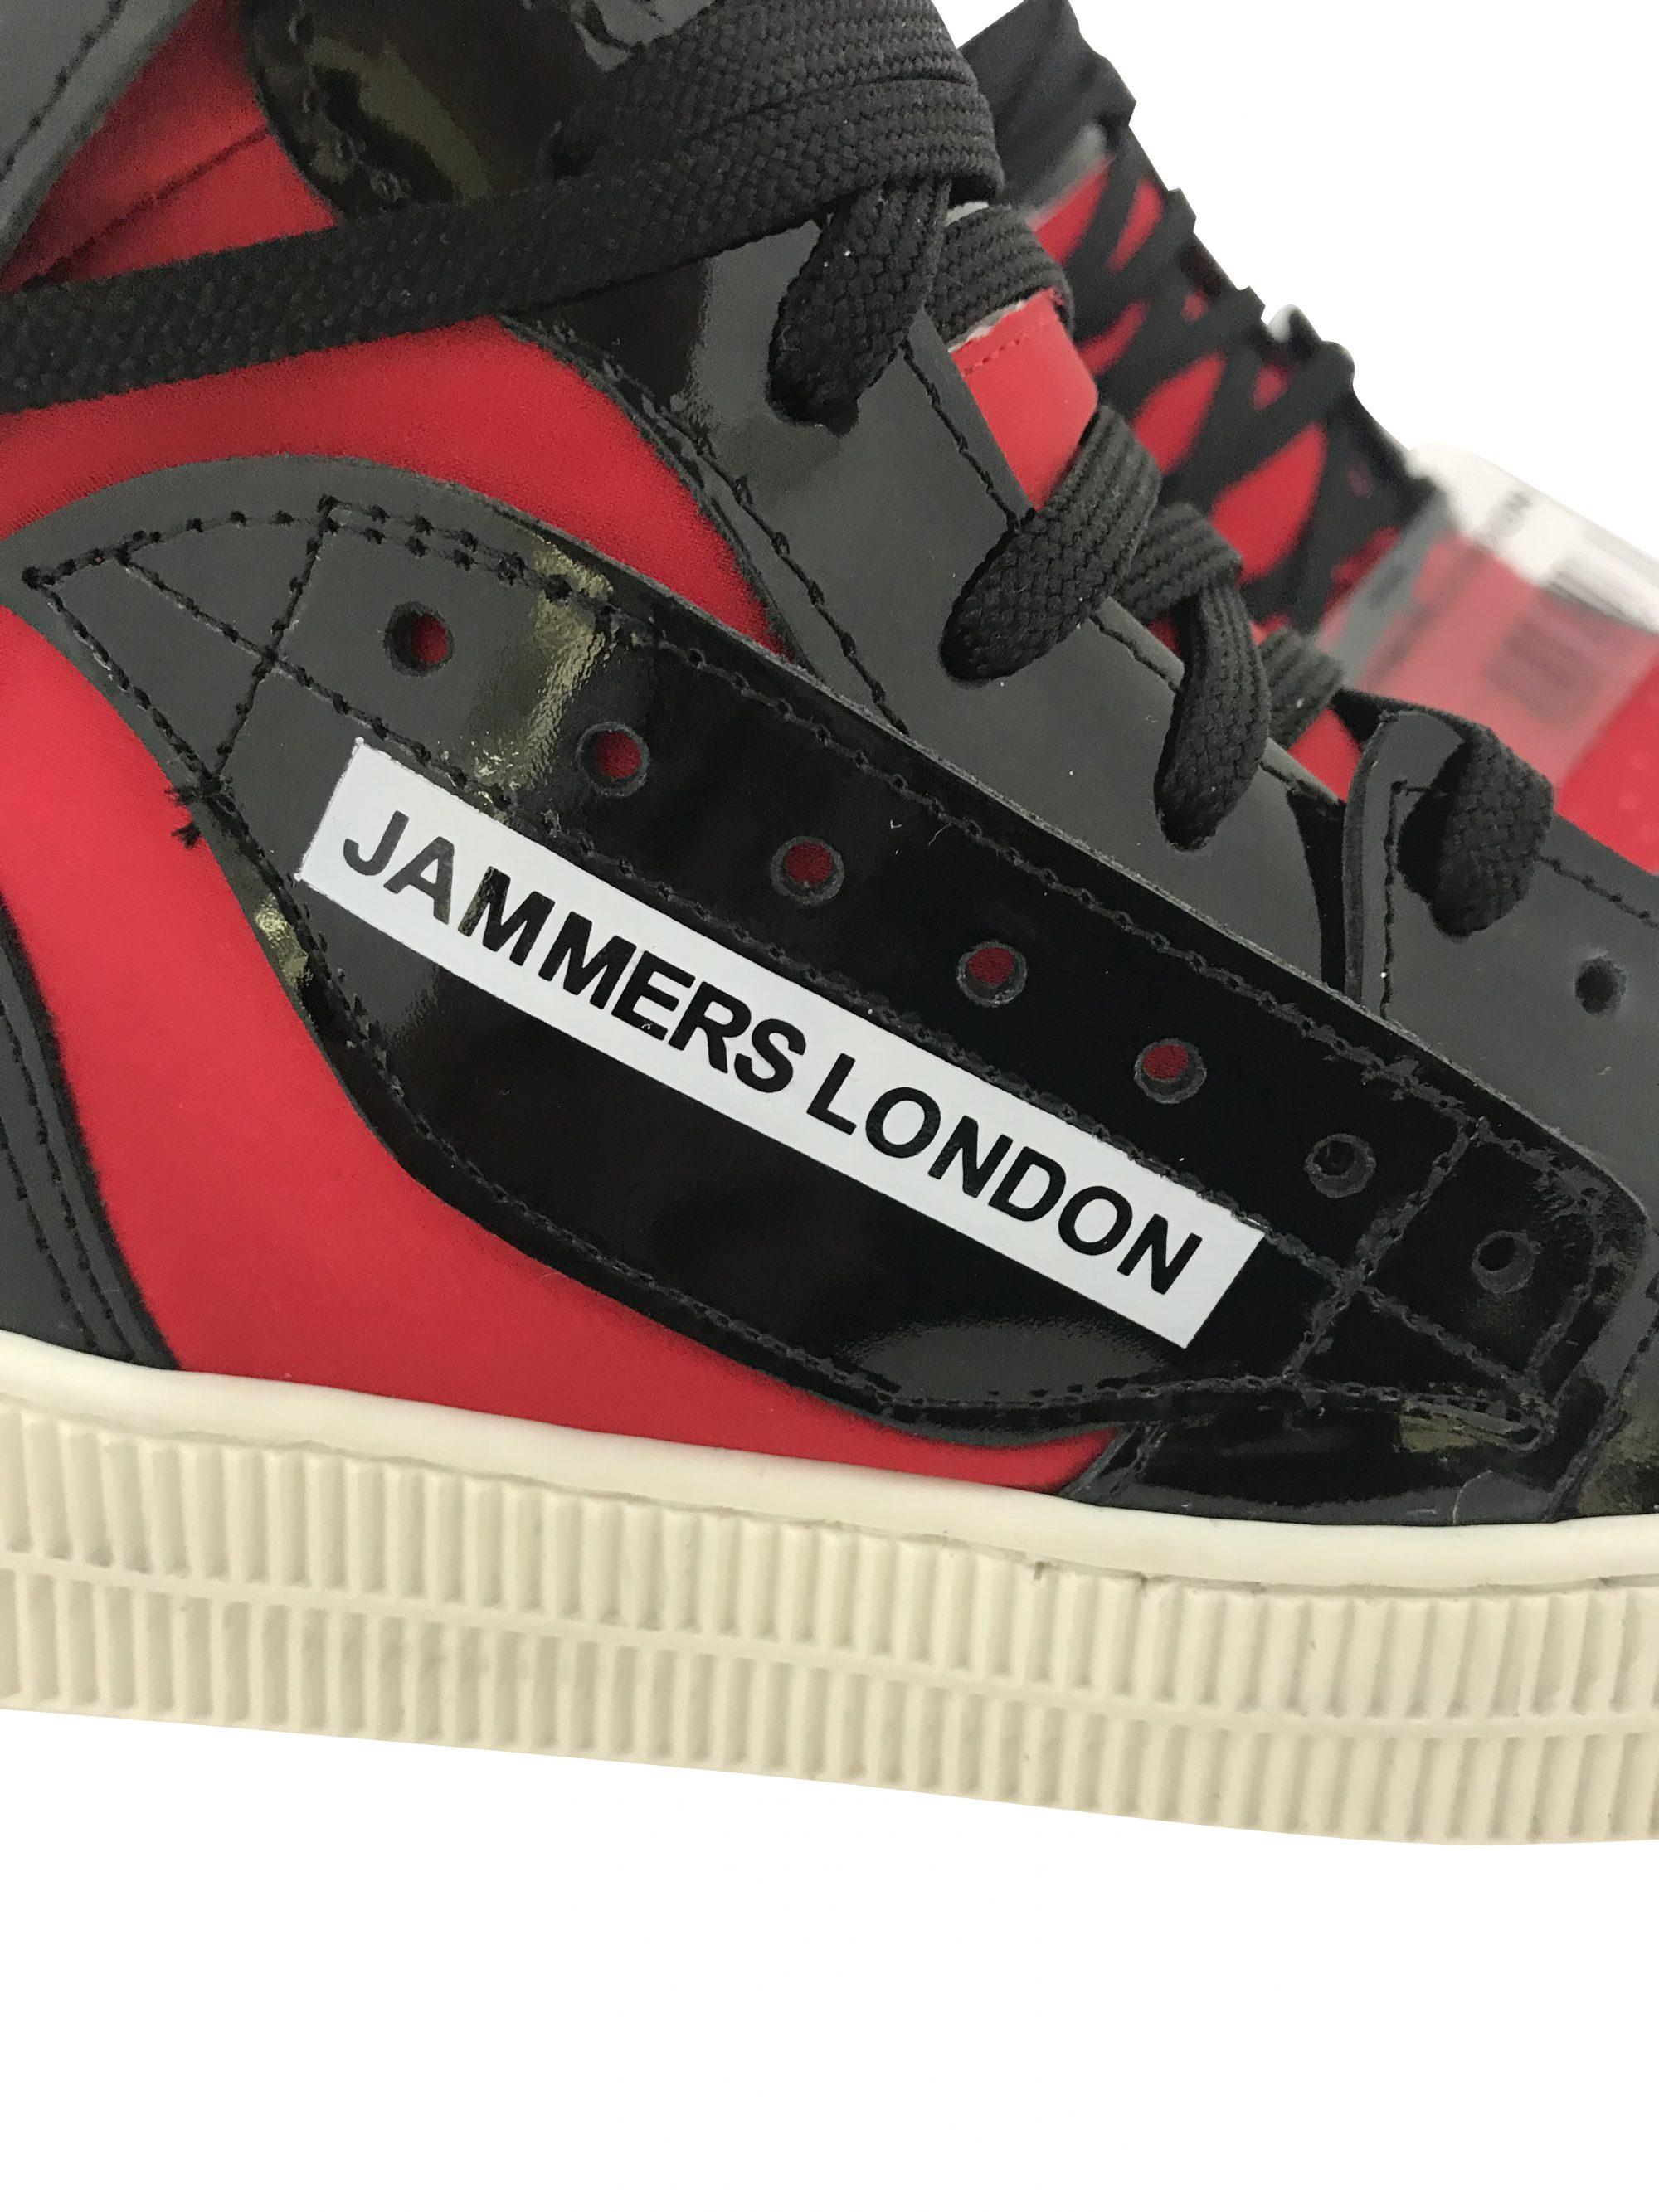 JAMMER LONDON OFF-CODE VERSIONE3